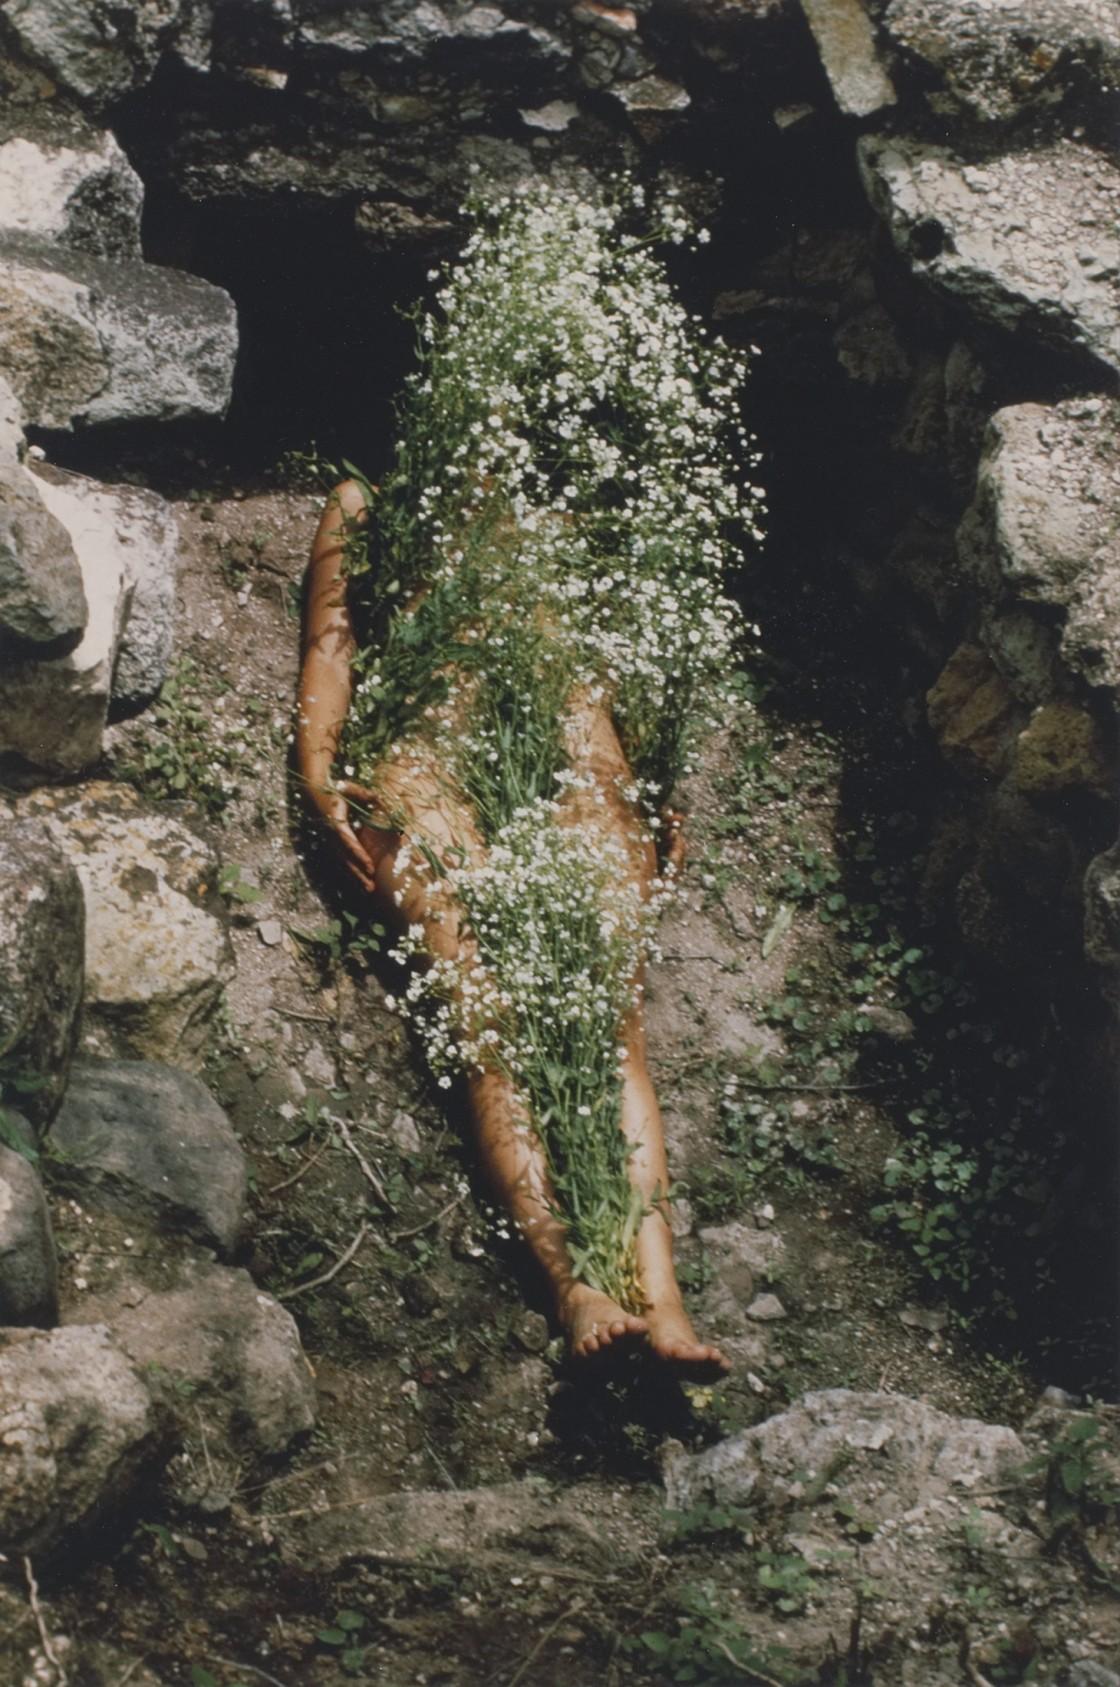 Ana Mendieta,  Imagen de Yagul, from the series Silueta Works in Mexico 1973-1977 , 1973. © The Estate of Ana Mendieta Collection, LLC.